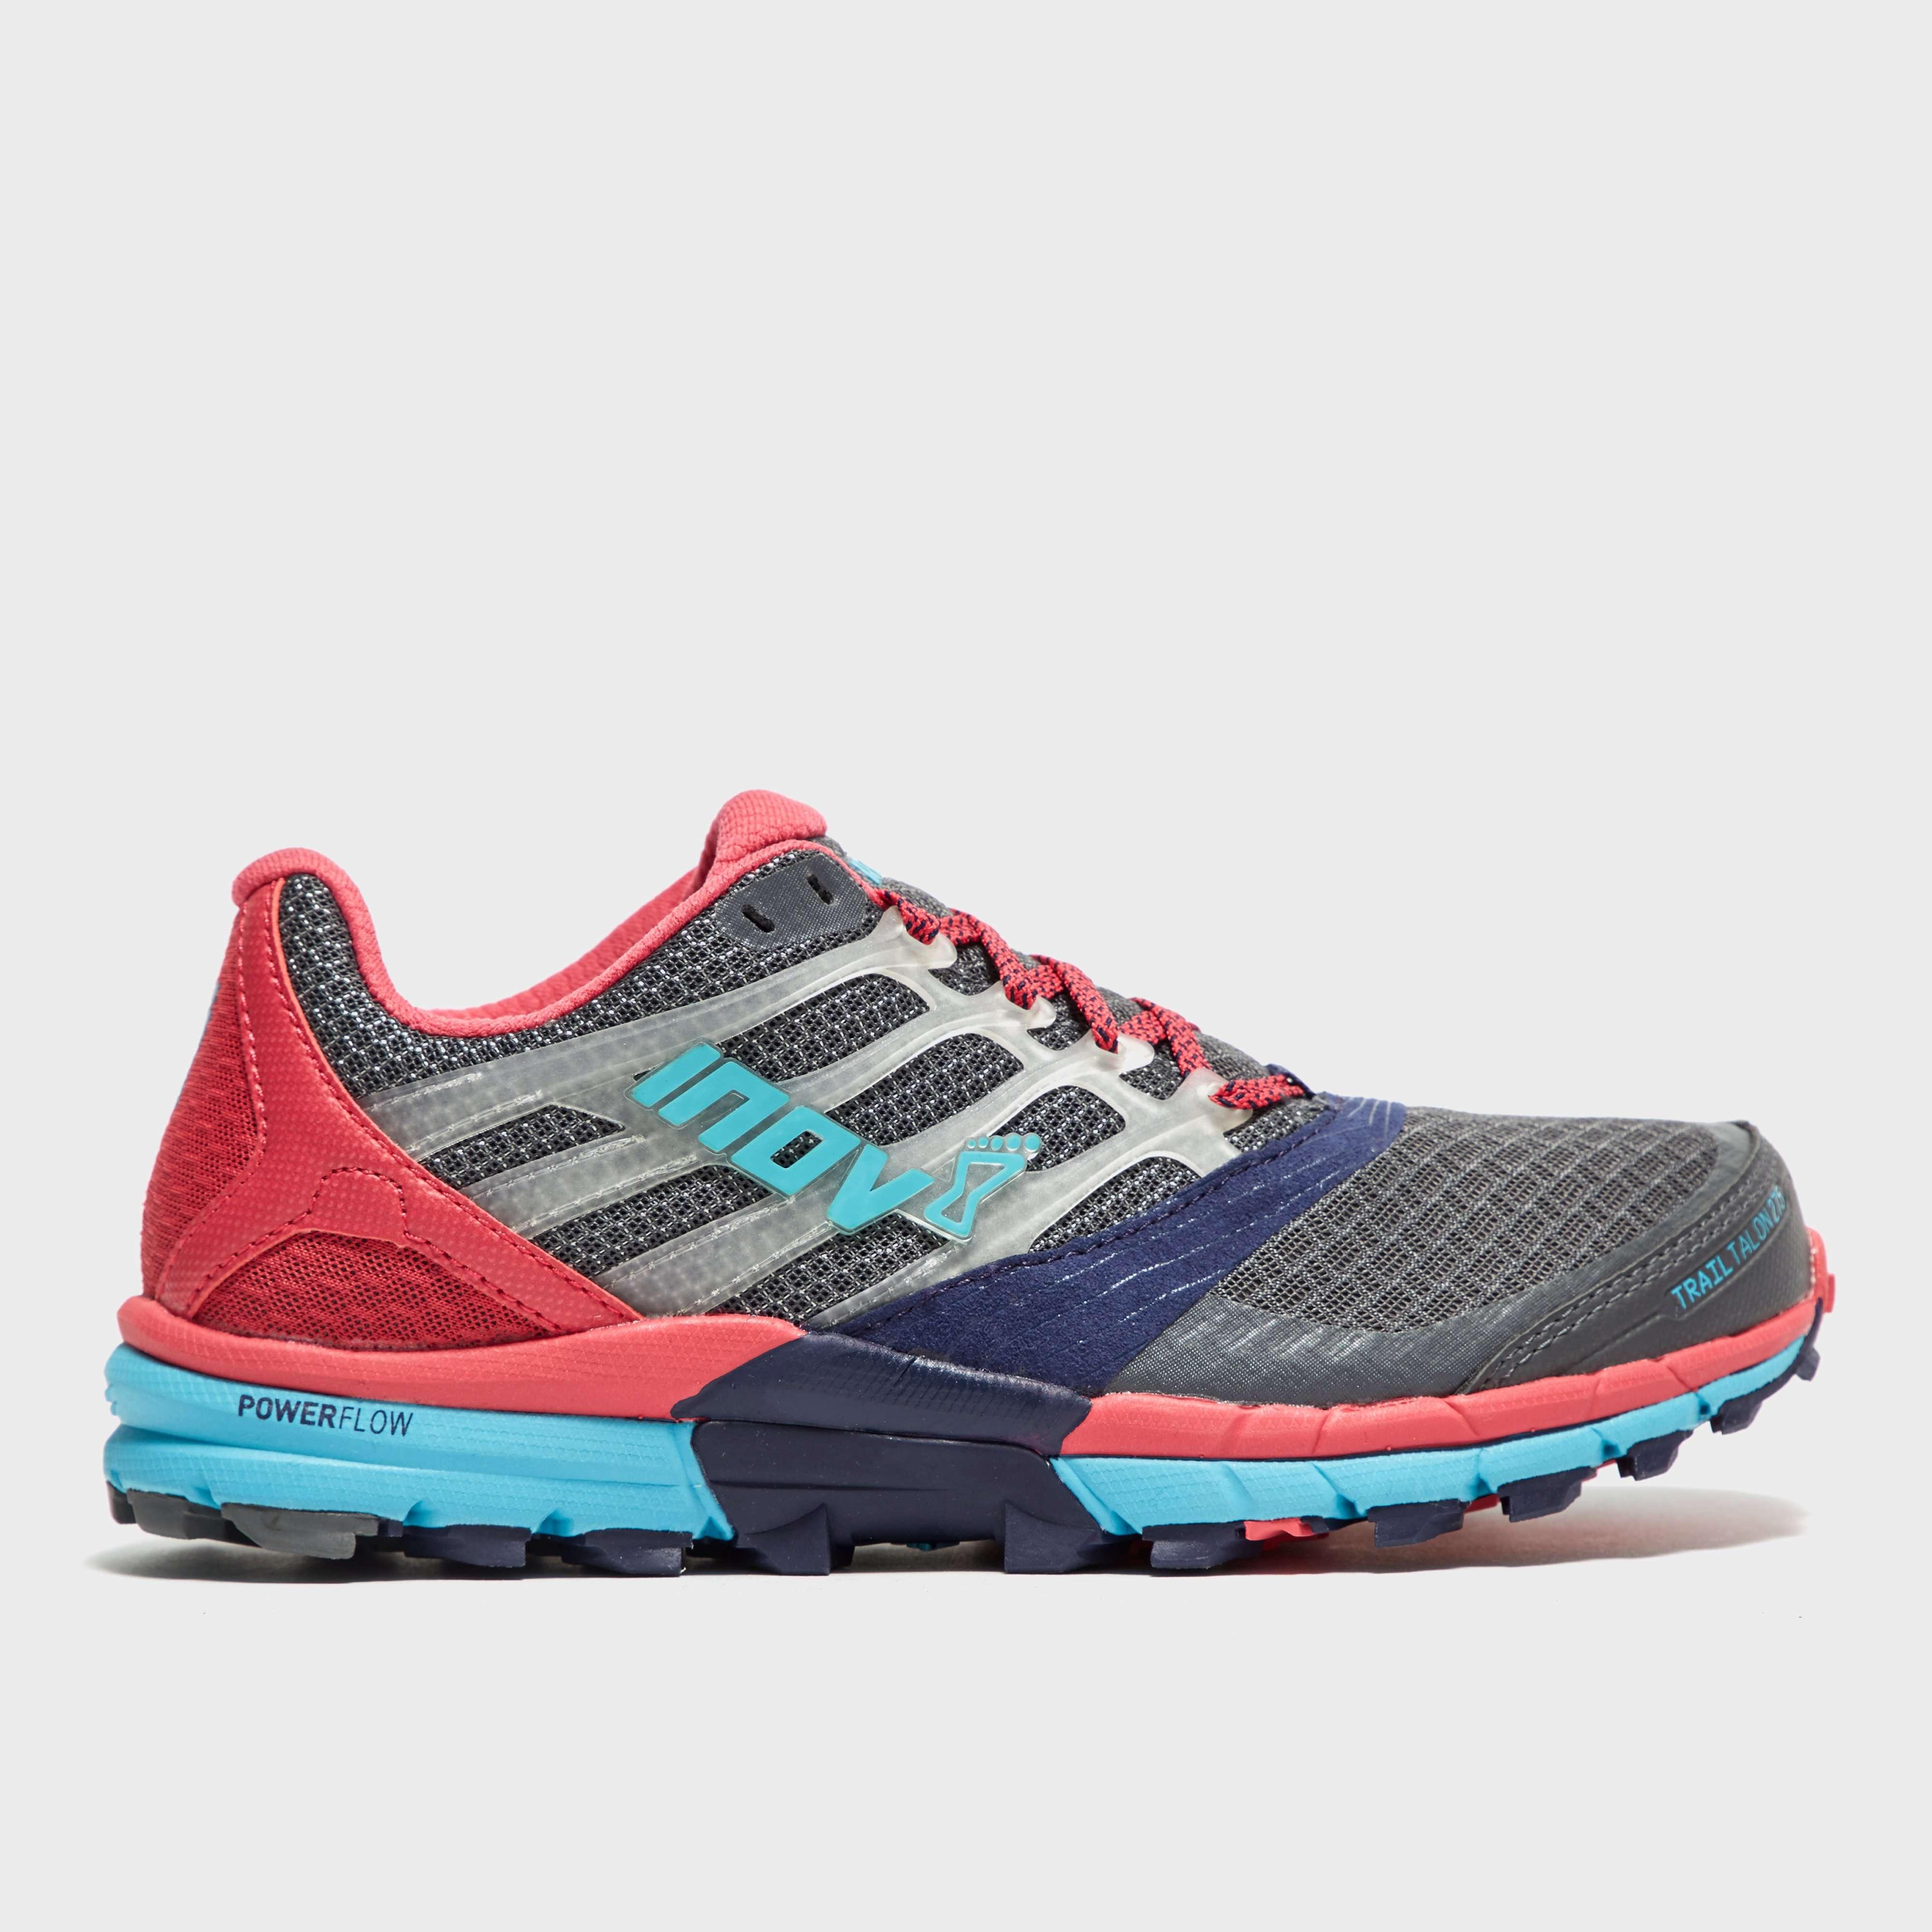 INOV-8 Women's TRAIL TALON™ 275 Running Shoes